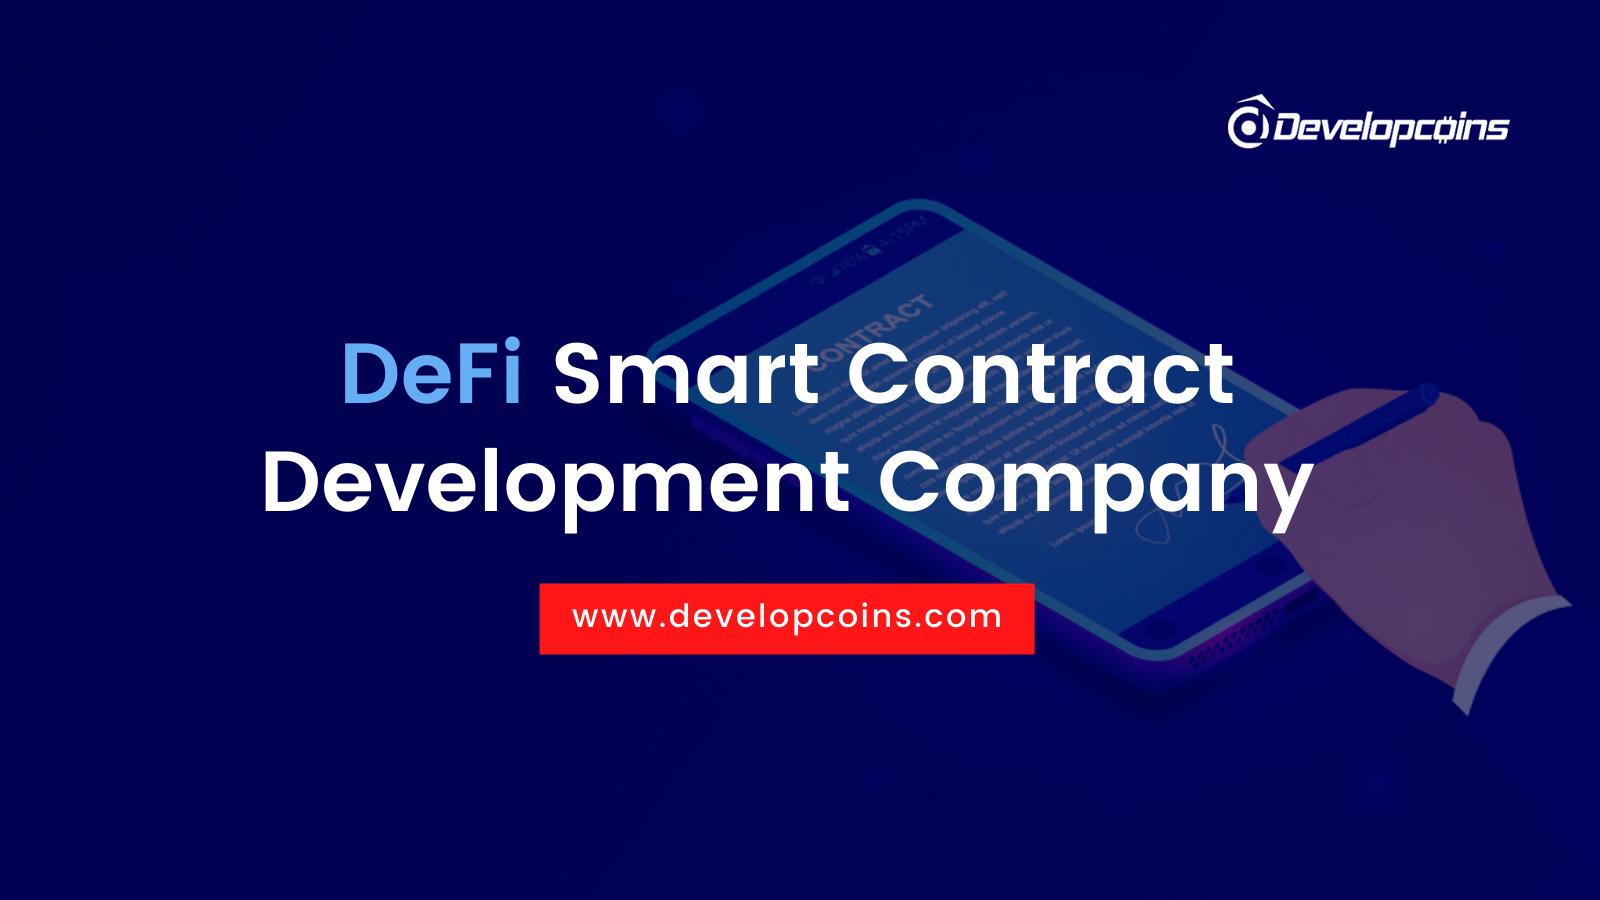 DeFi Smart Contract Development Company